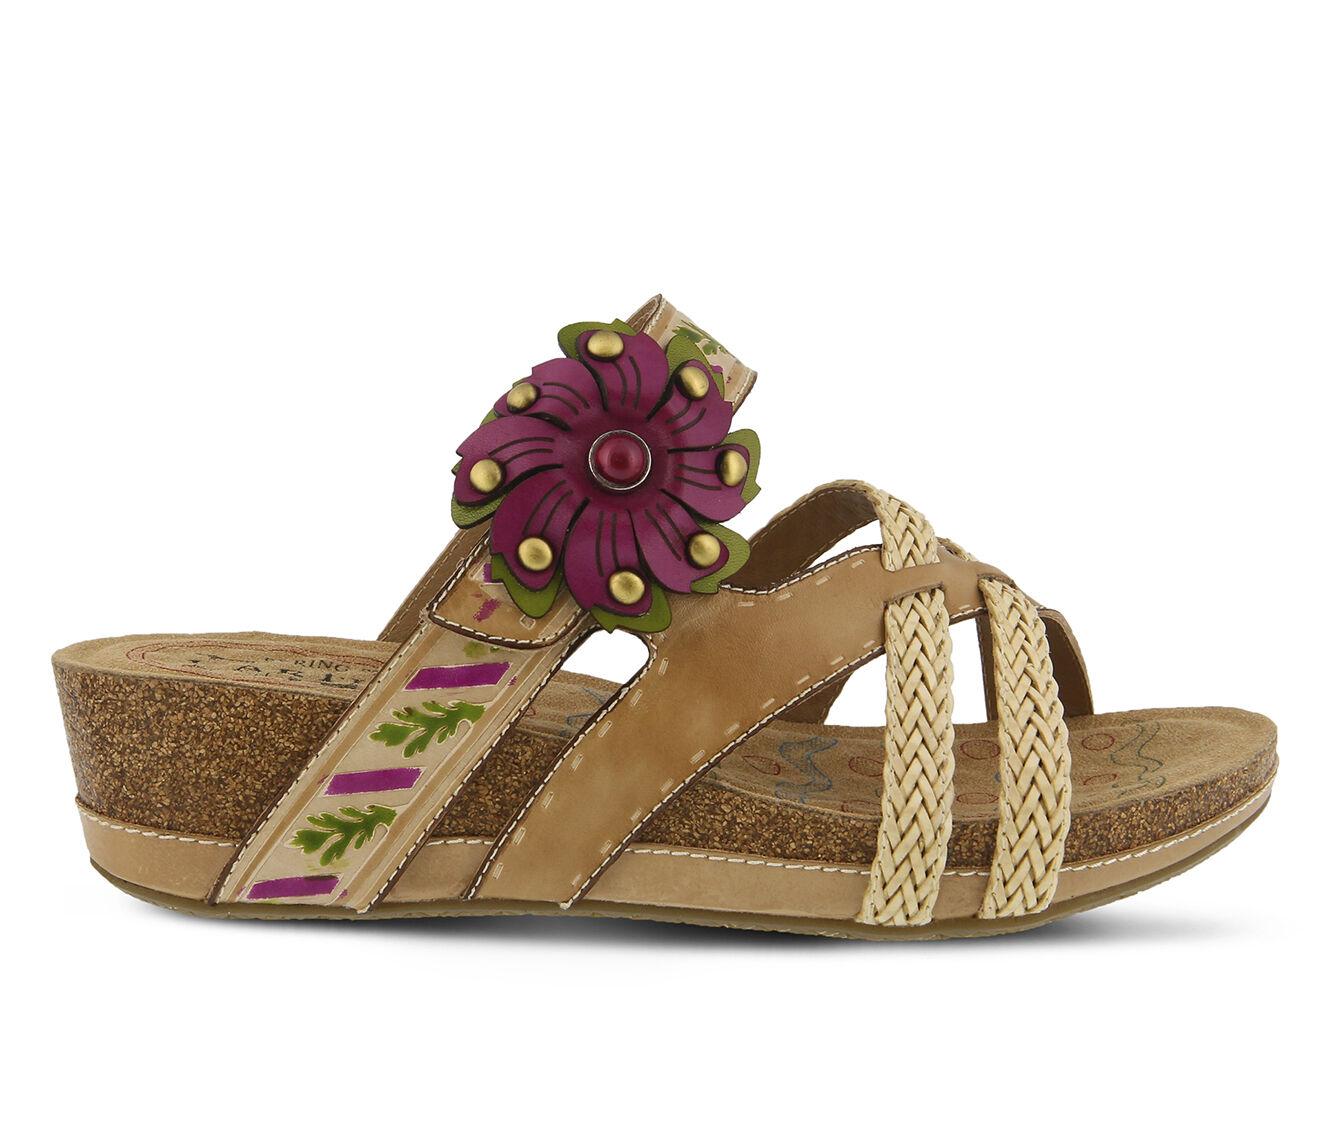 uk shoes_kd7396